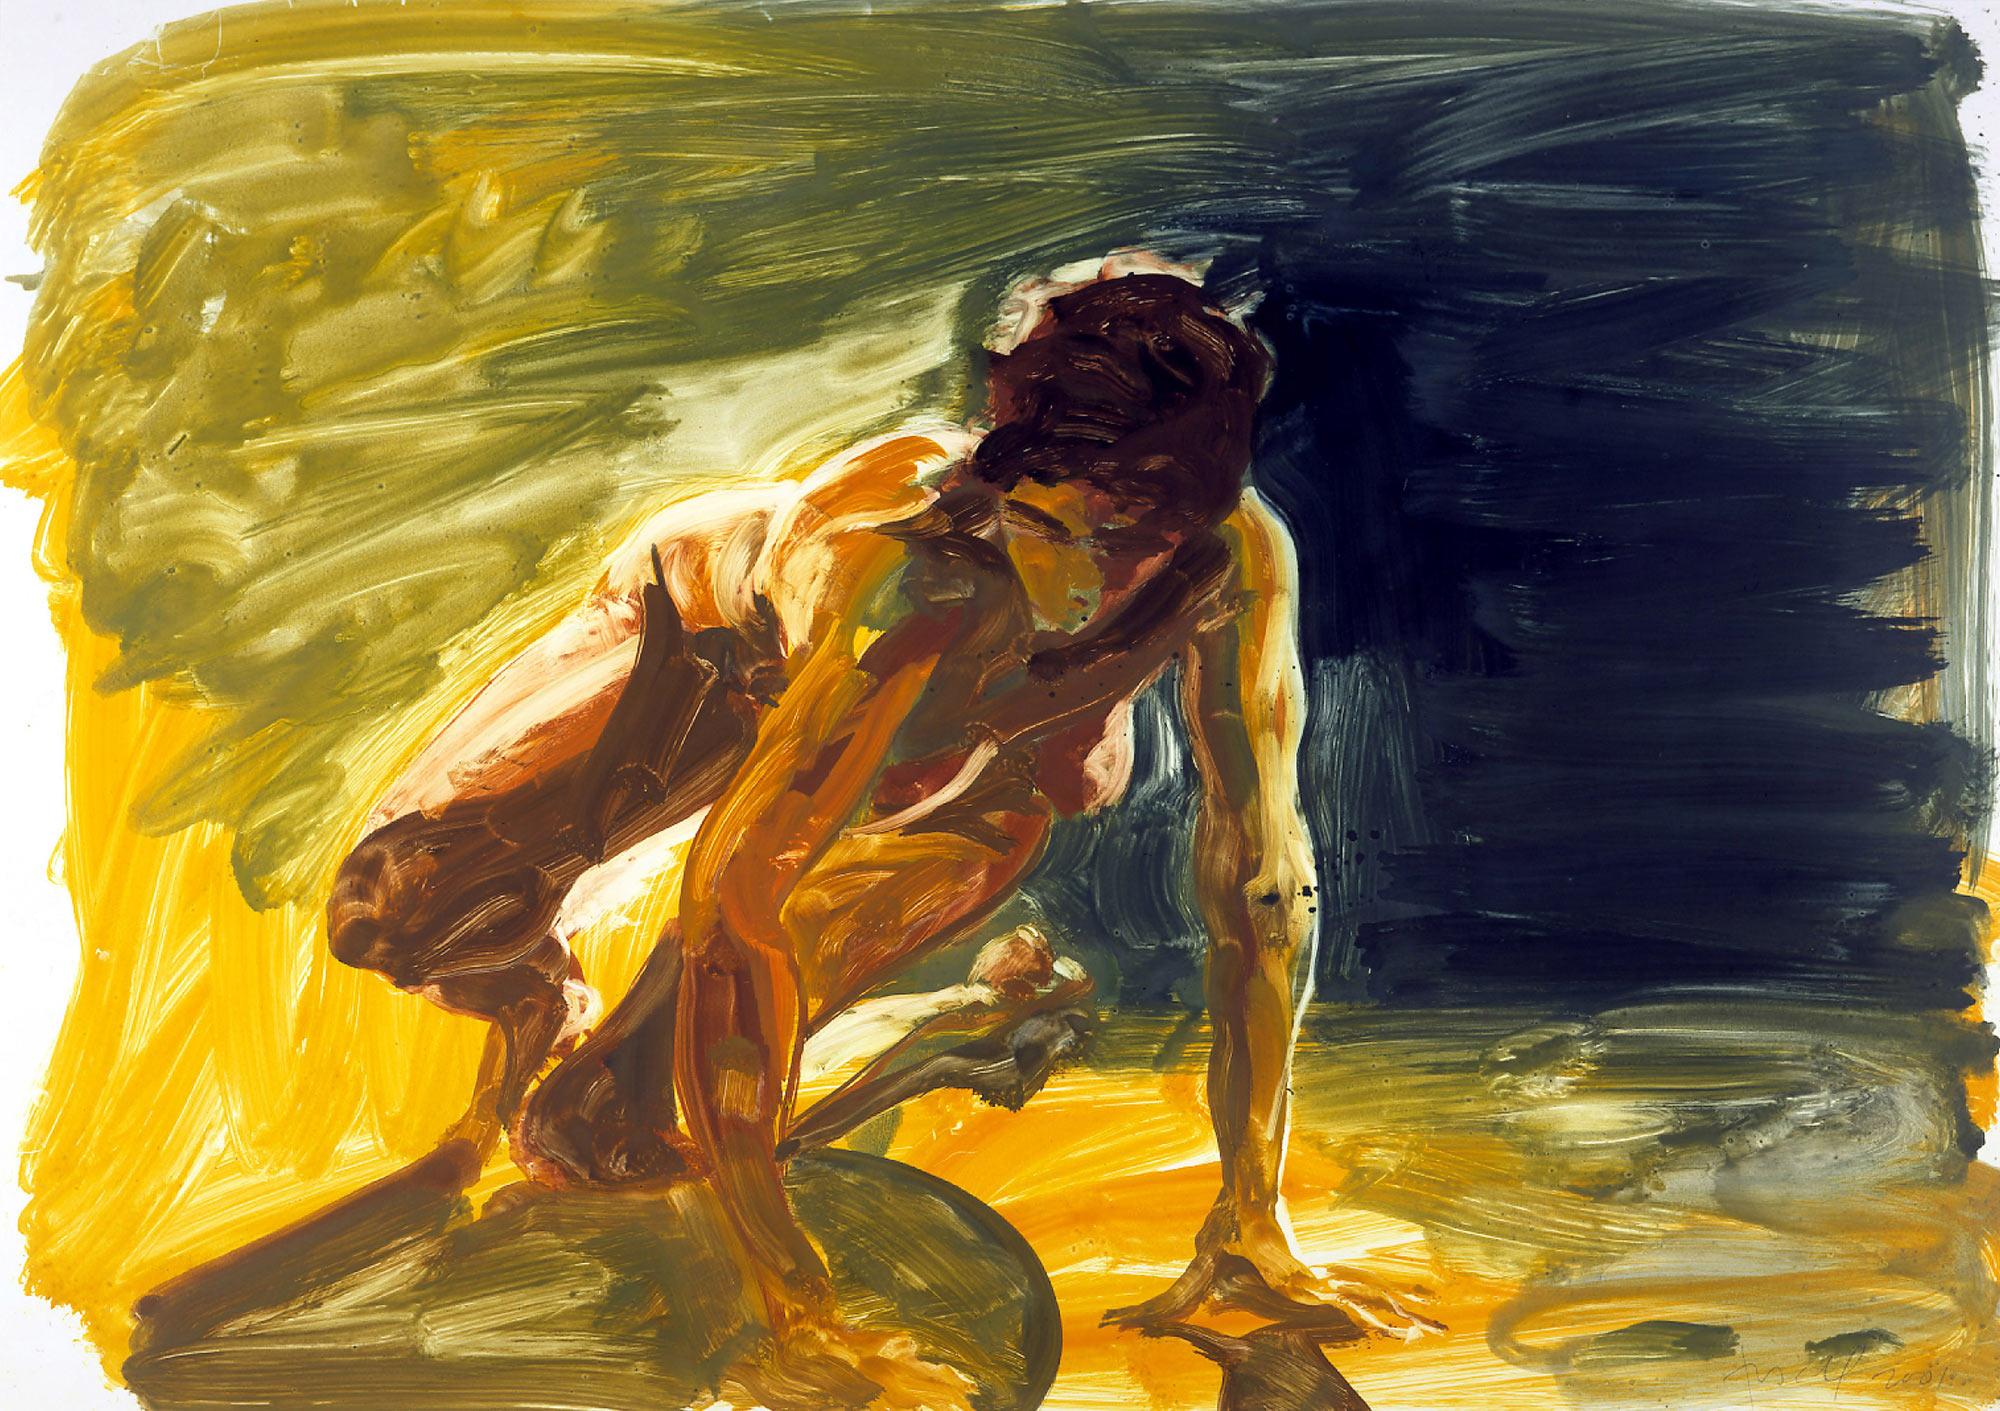 Untitled (Crouching), 2001.